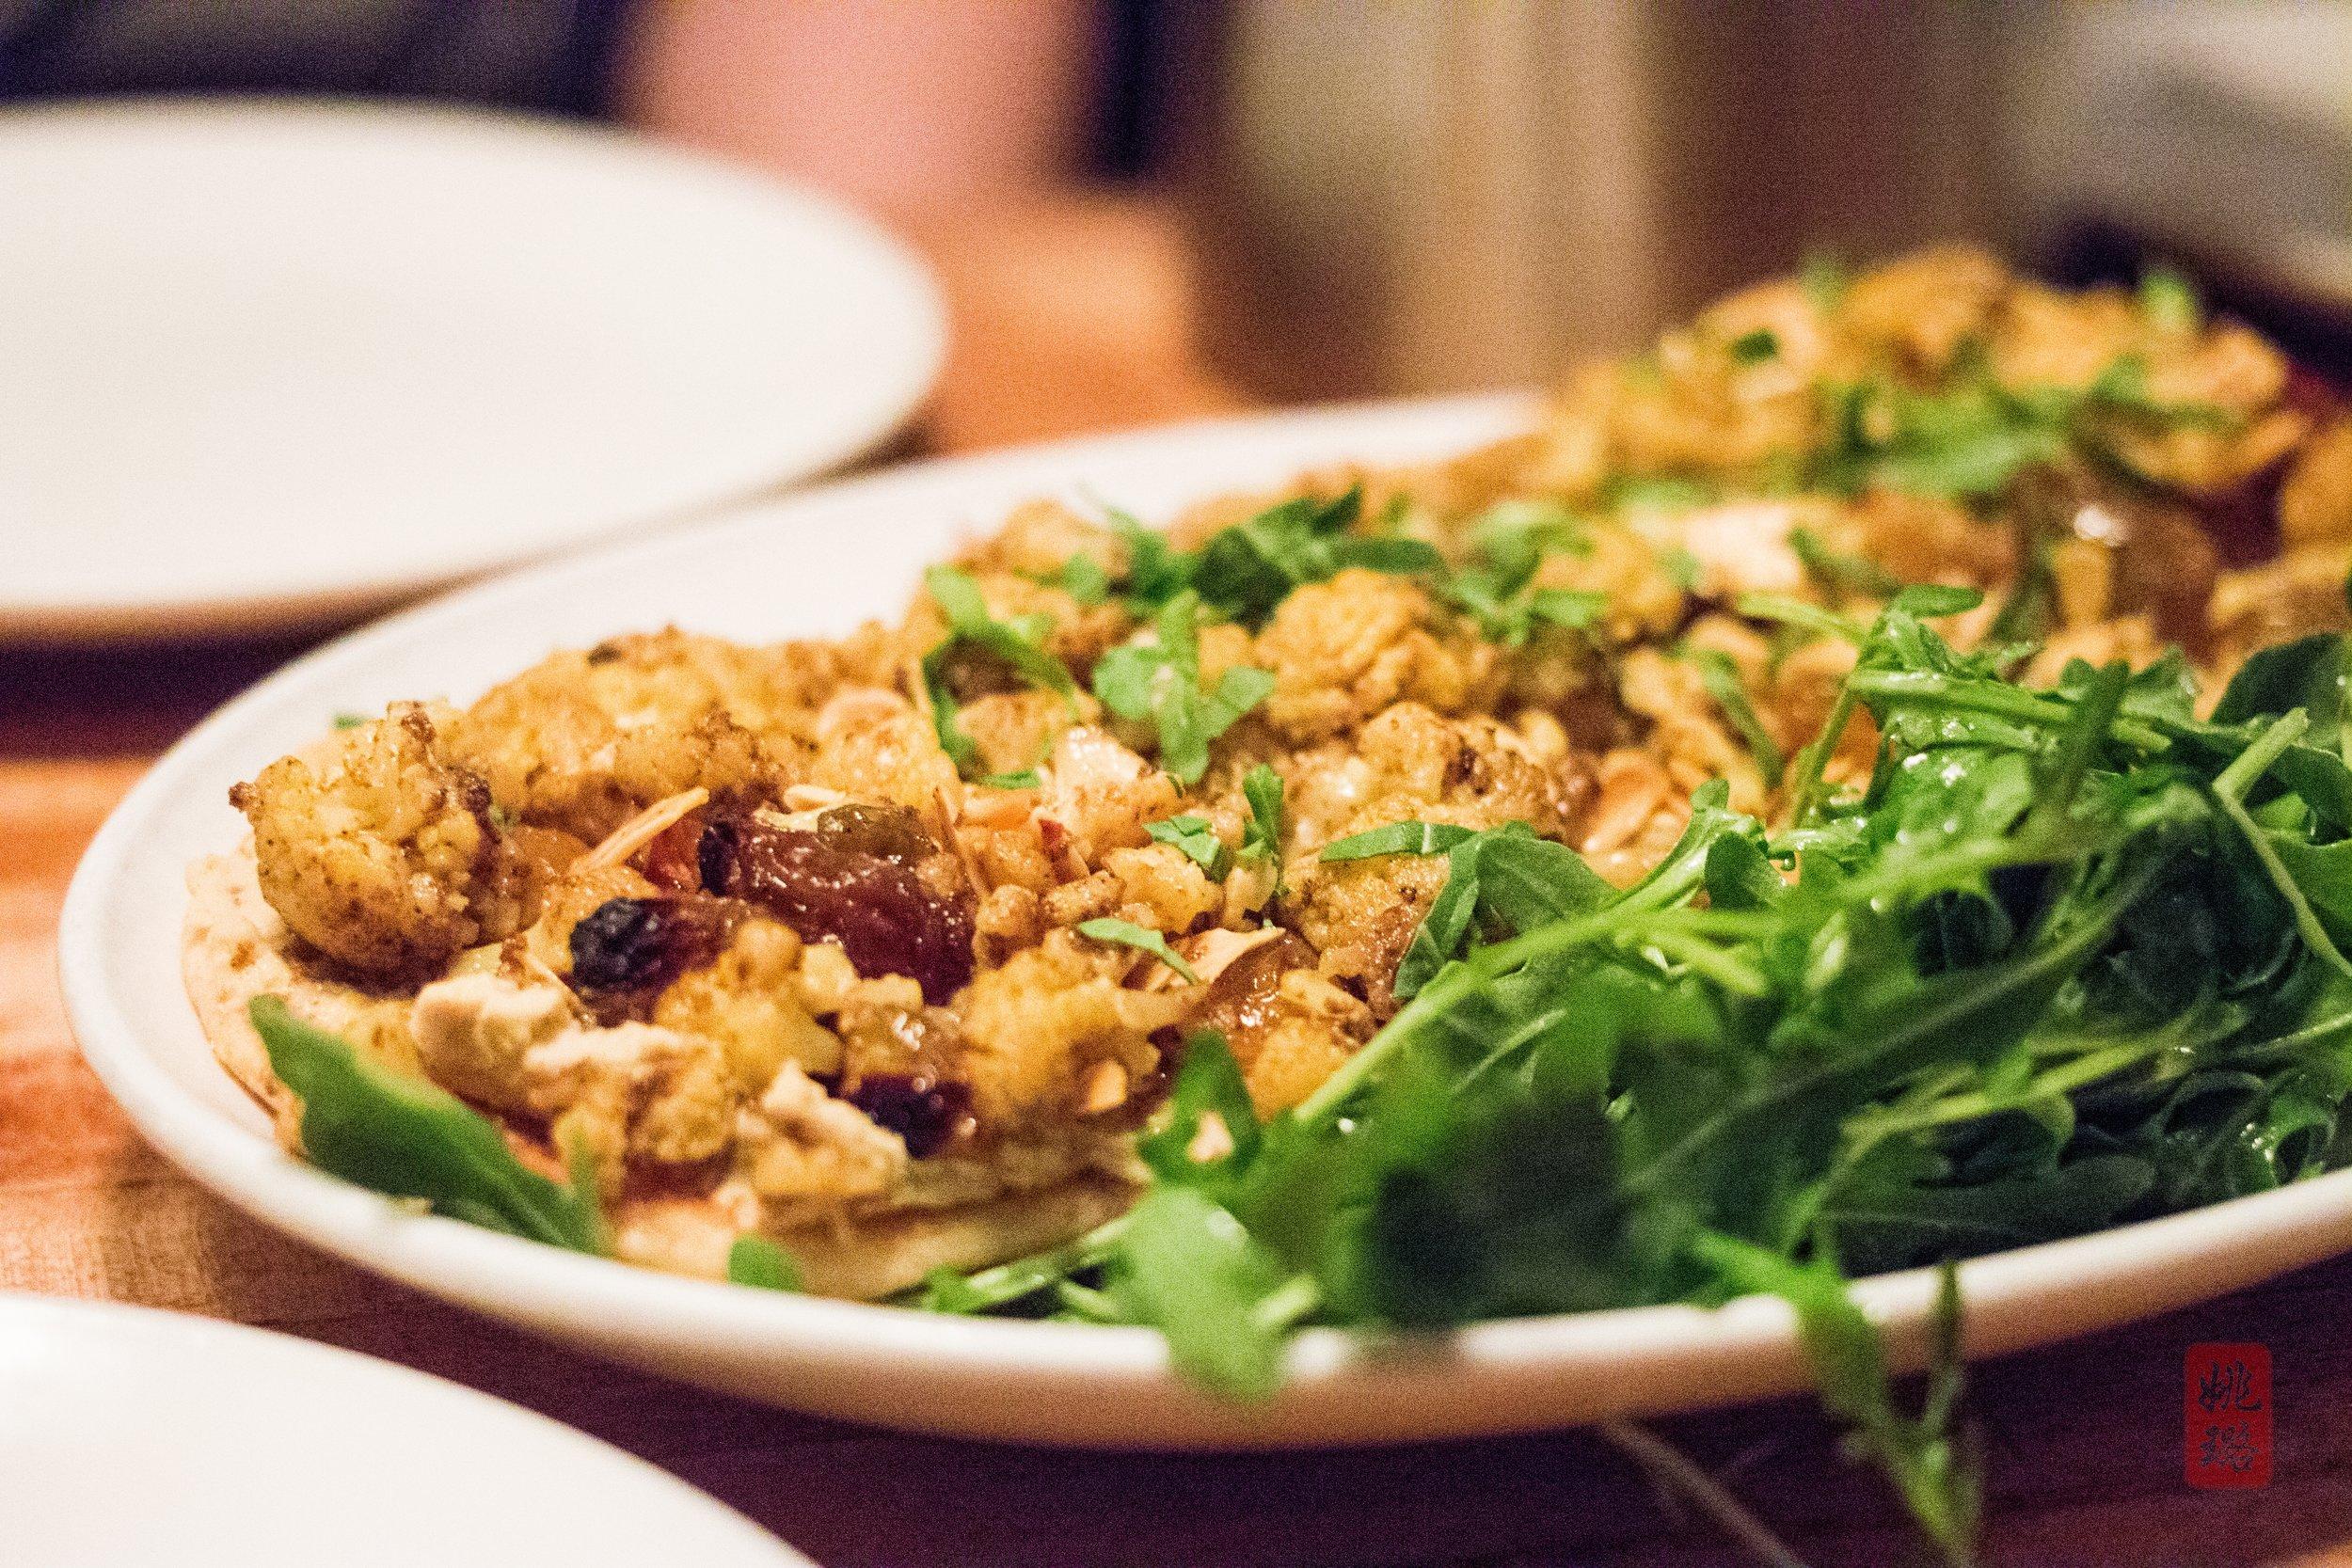 Cauliflower tartine:curry-roasted cauliflower, hummus, golden raisins, toasted almonds, and parsley on toasted naan